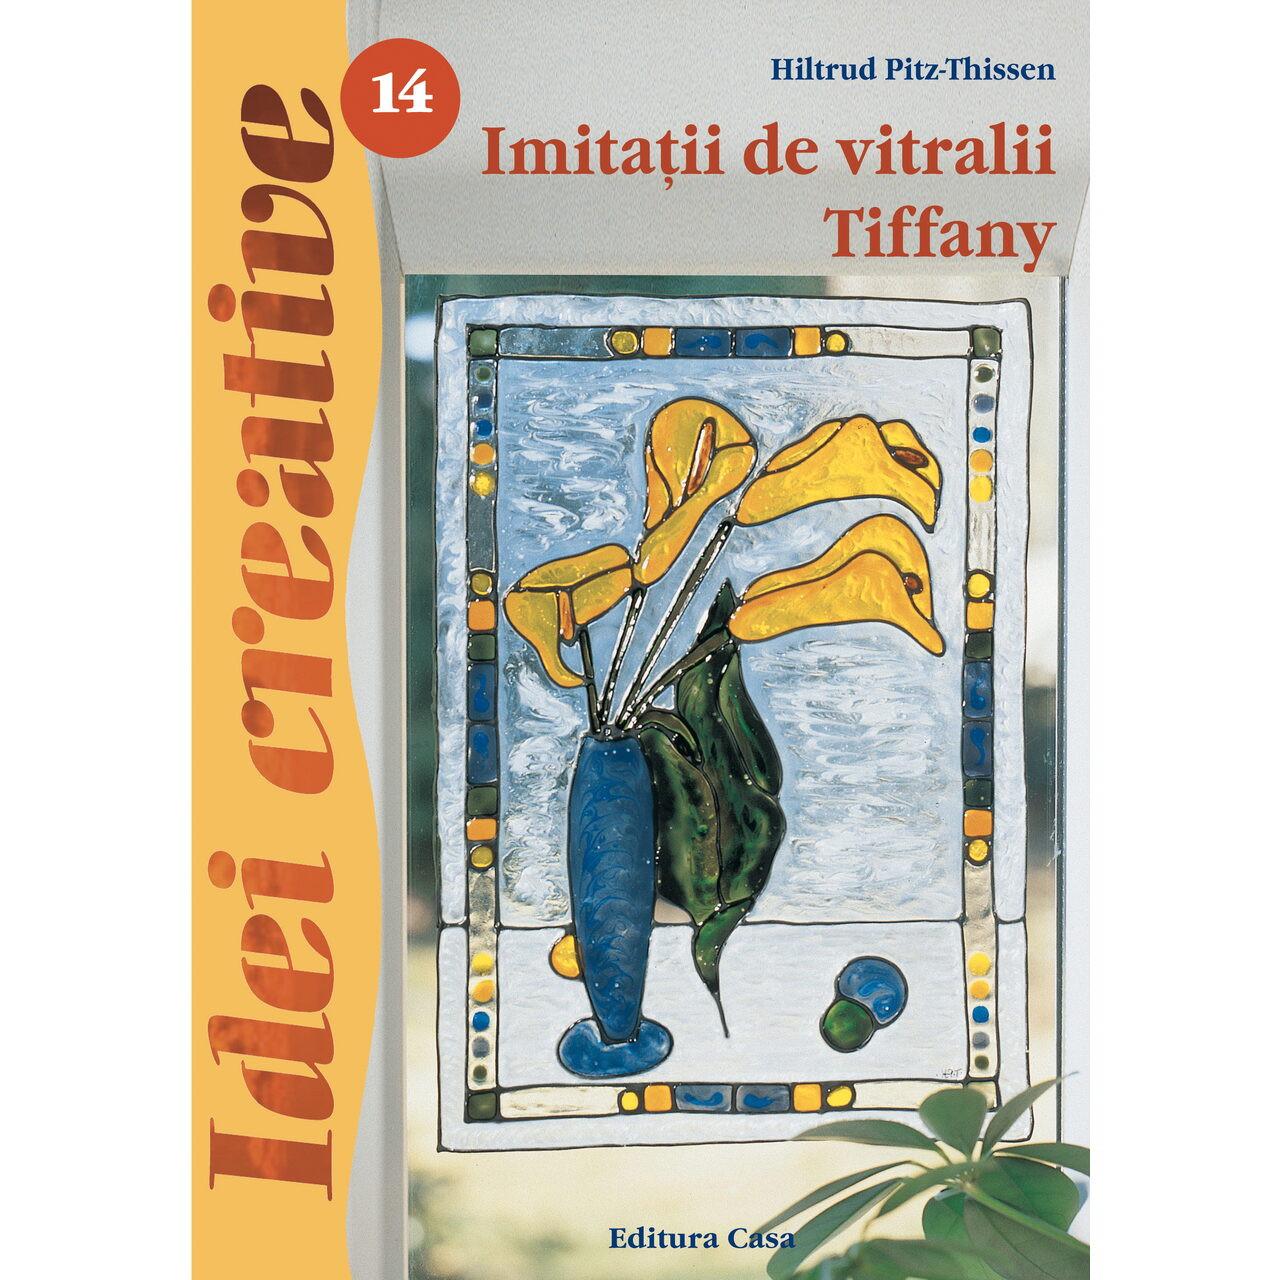 Imitatii de vitralii Tiffany – Idei creative 14